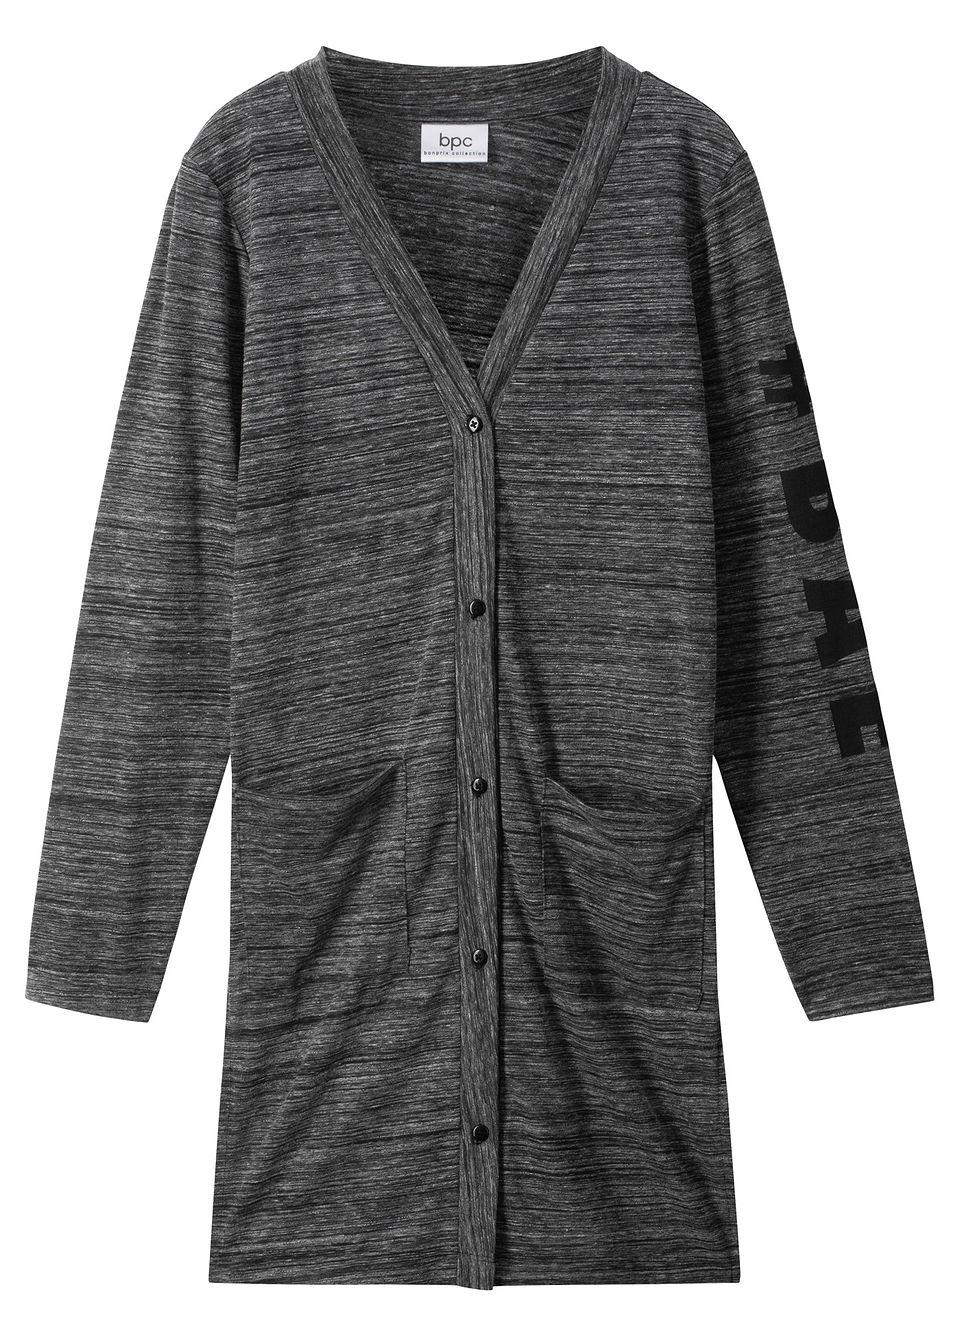 Jachetă lungă din tricot bonprix